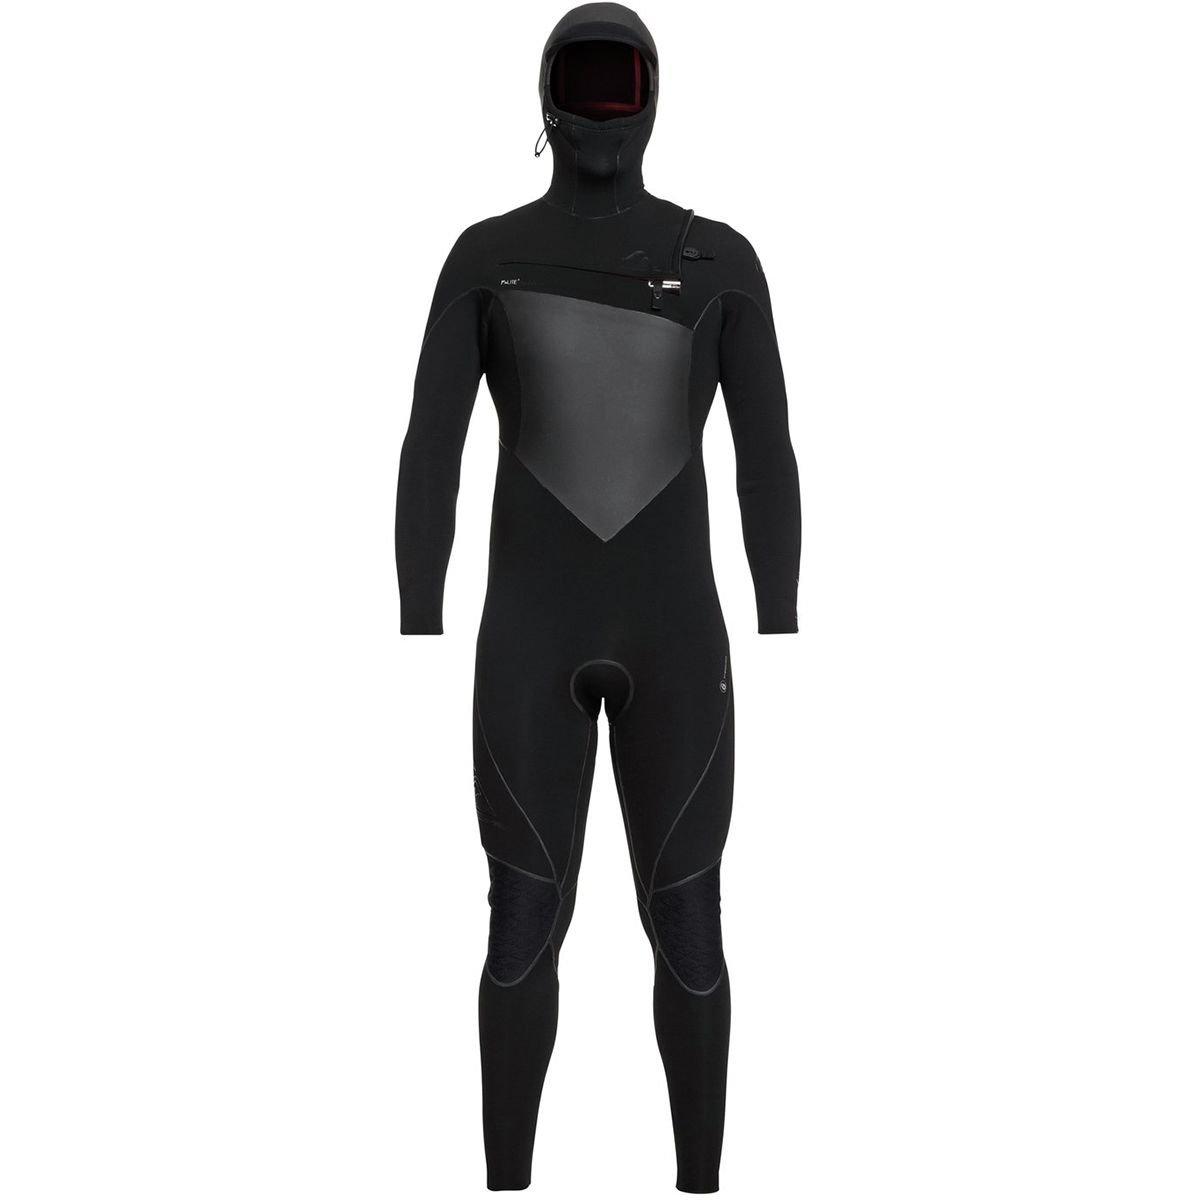 Quiksilver Mens 5/4/3 Highline+ Cz Hyd Hd Black Full Wetsuit Size LT   B07F9LDYR6